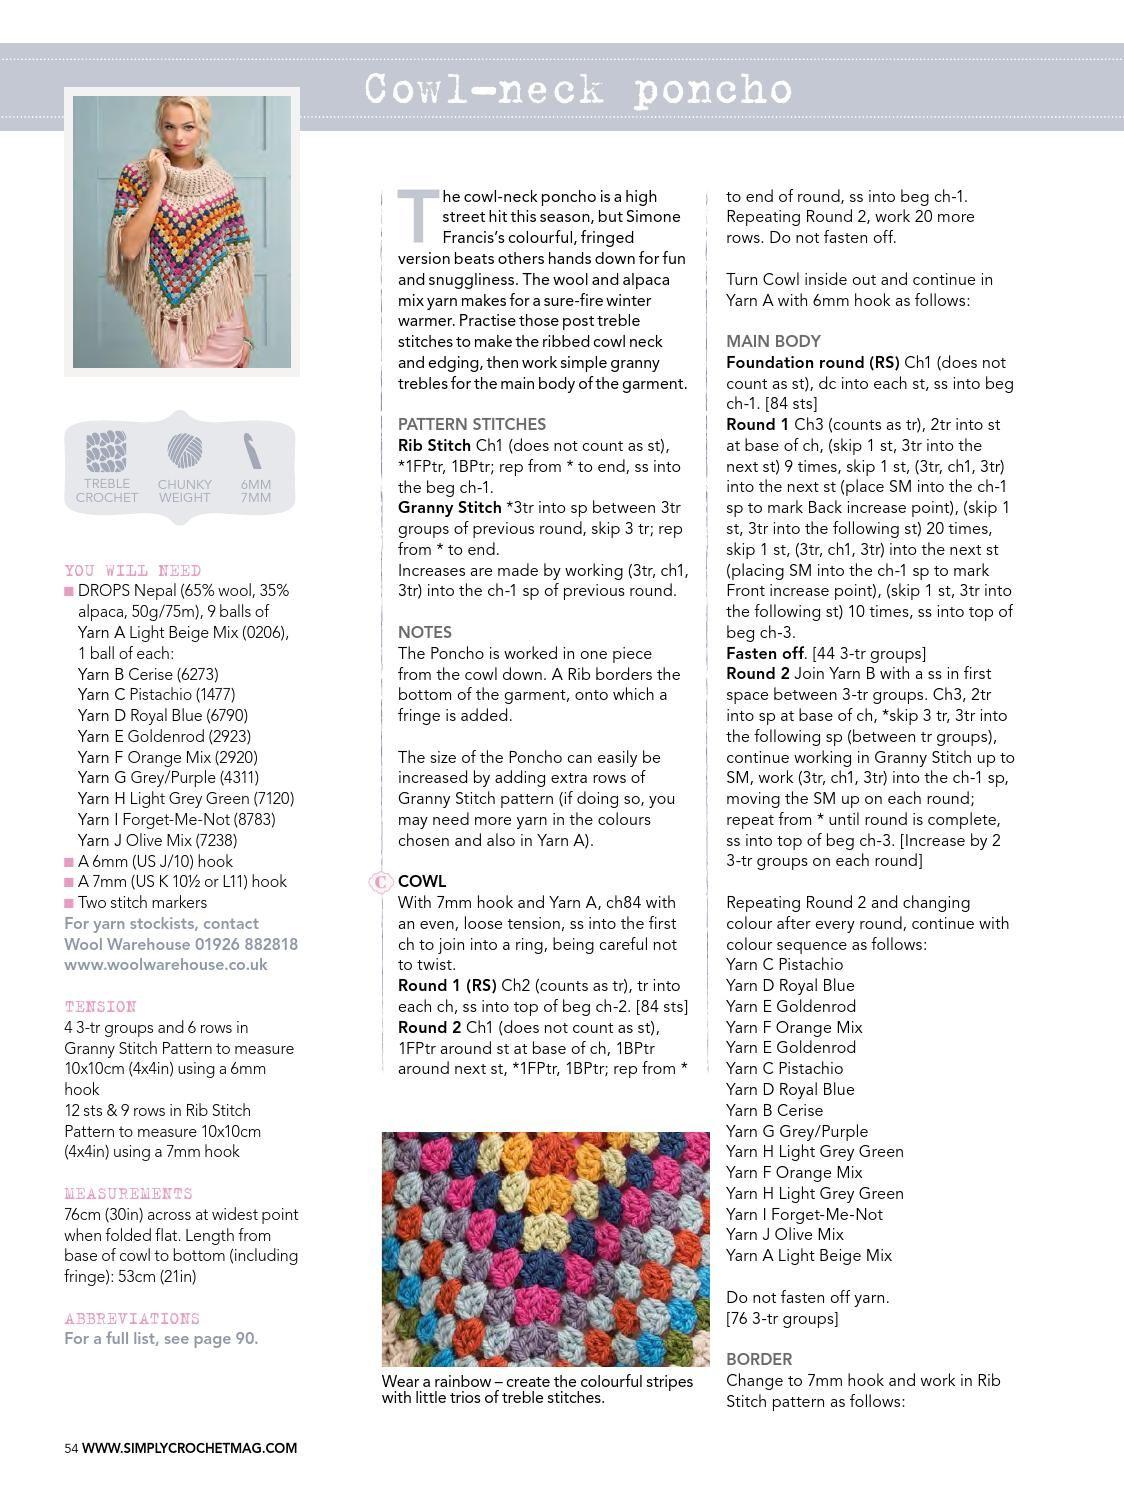 Simply crochet issue 25 december 2014 | Crocheting | Pinterest ...